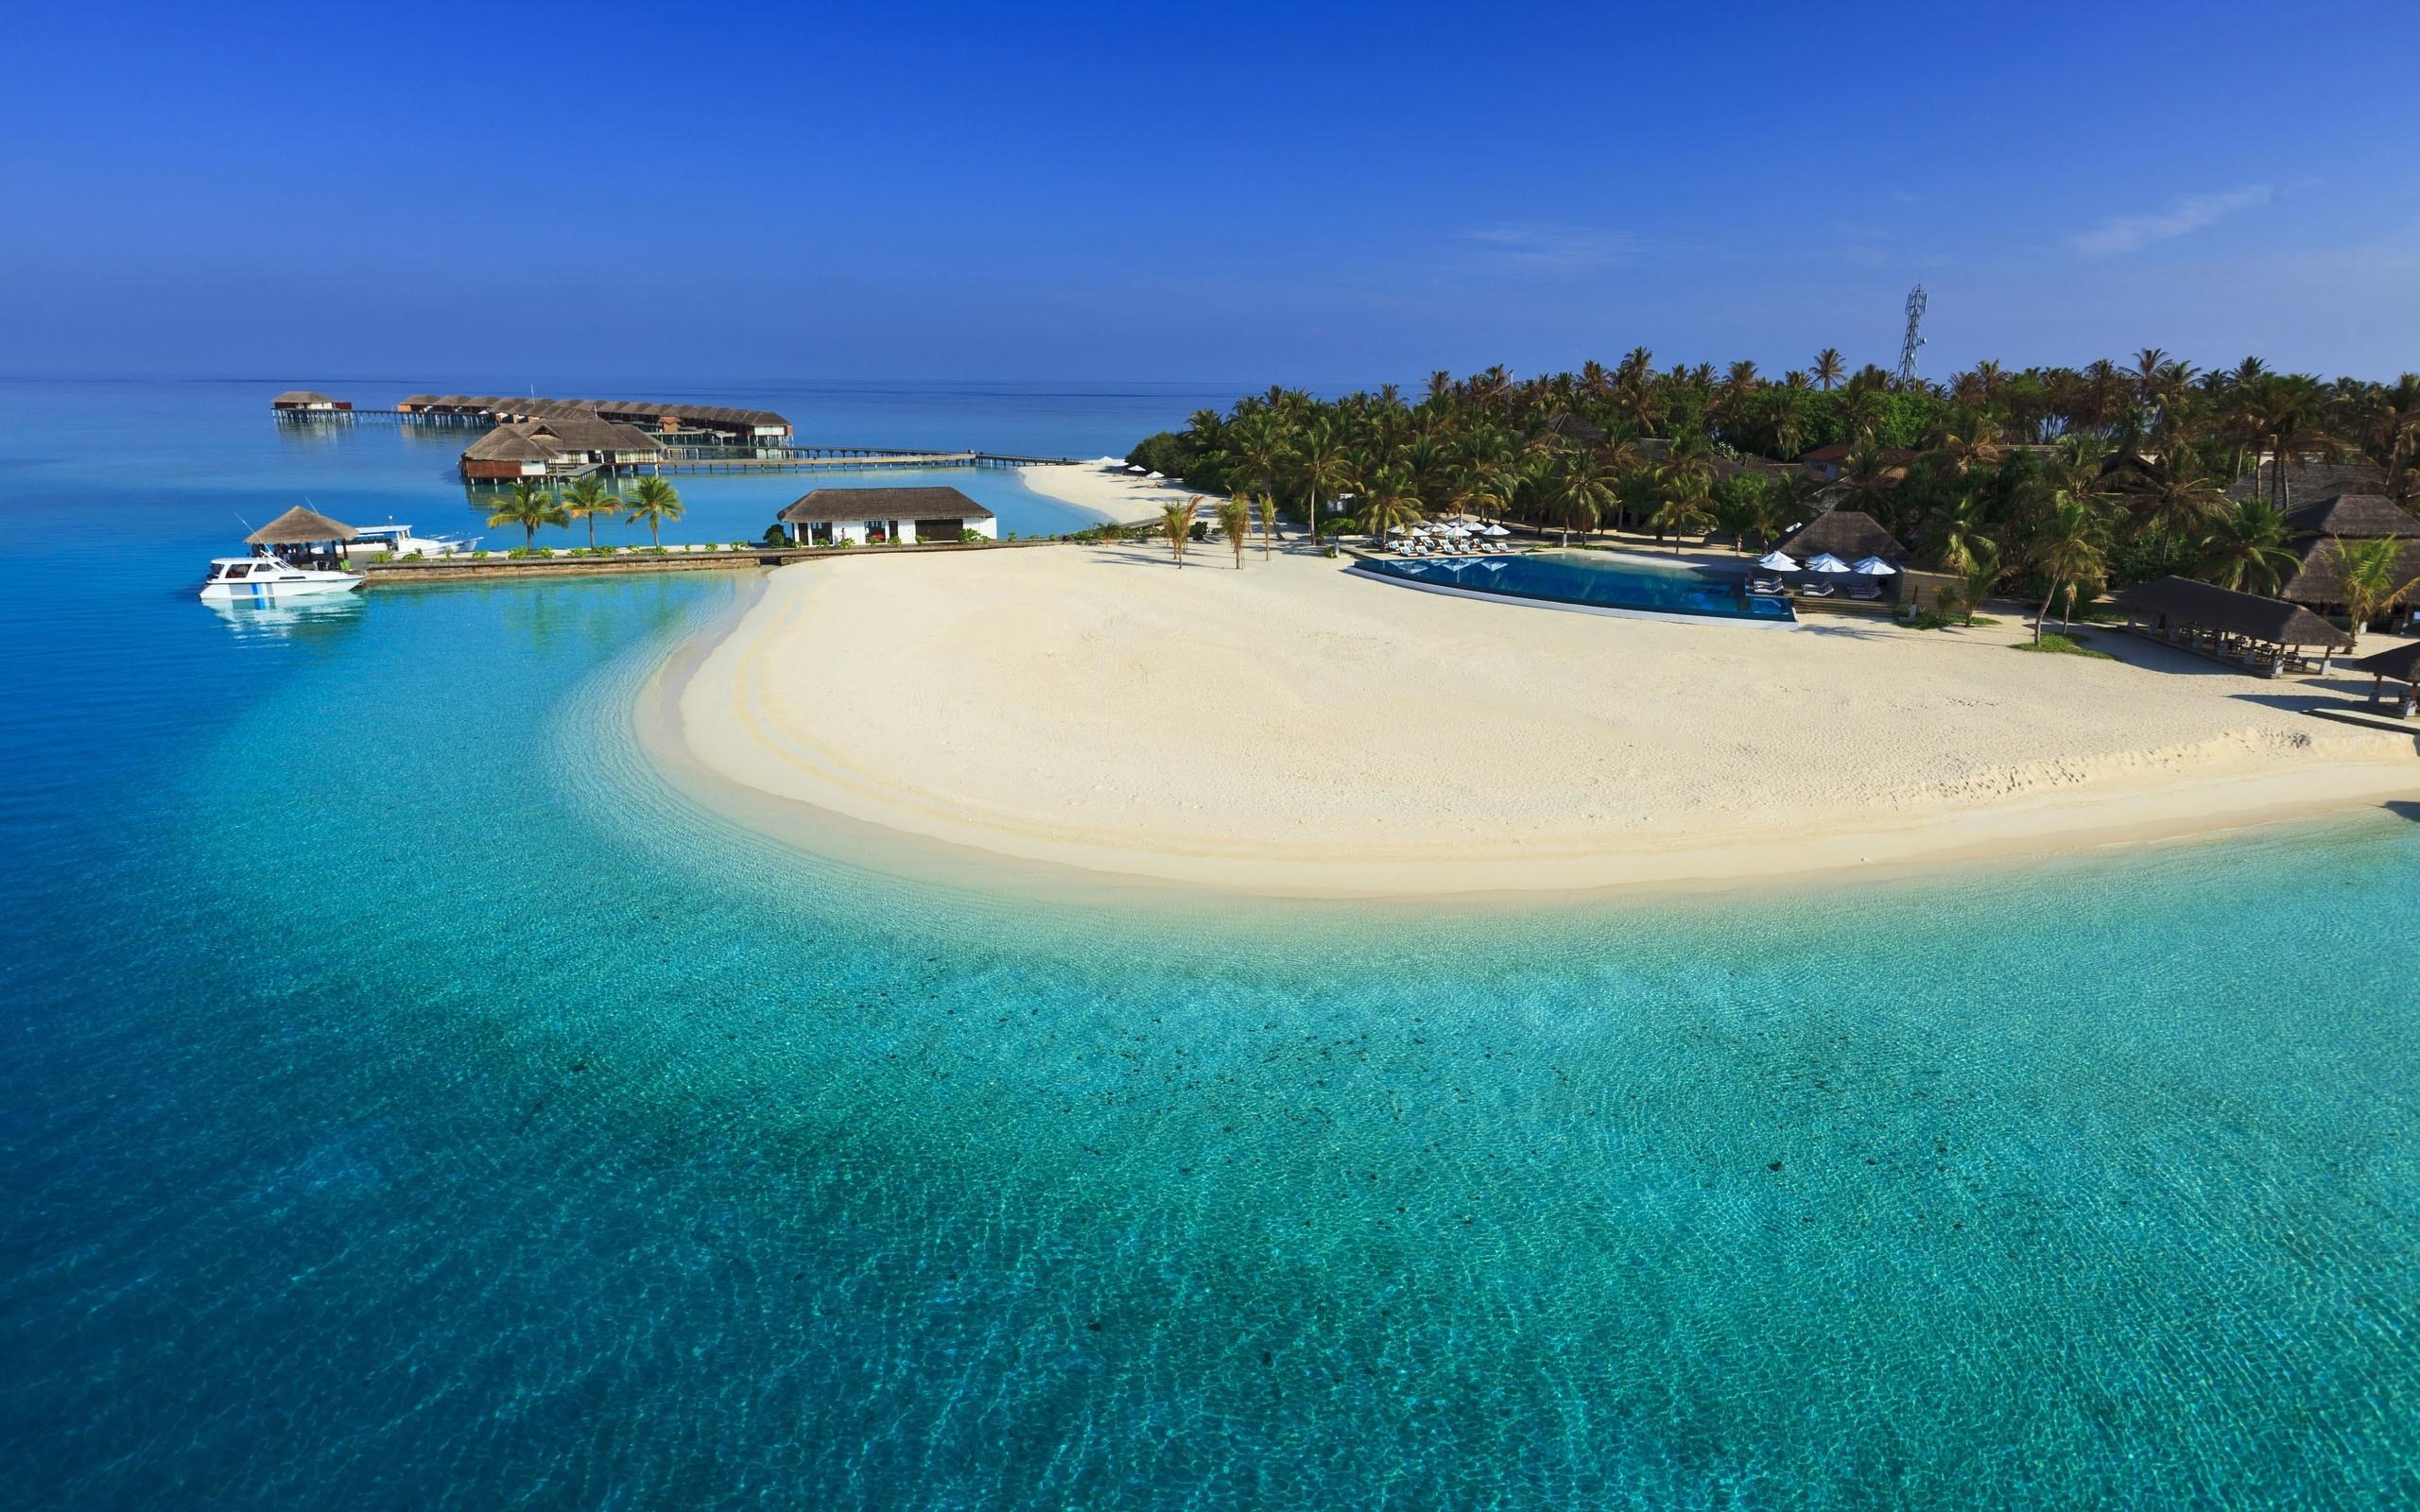 Explore Beautiful Beach, Beautiful Places, and more! Maldives Luxury Resort  Iphone Panoramic Wallpaper HD Pic